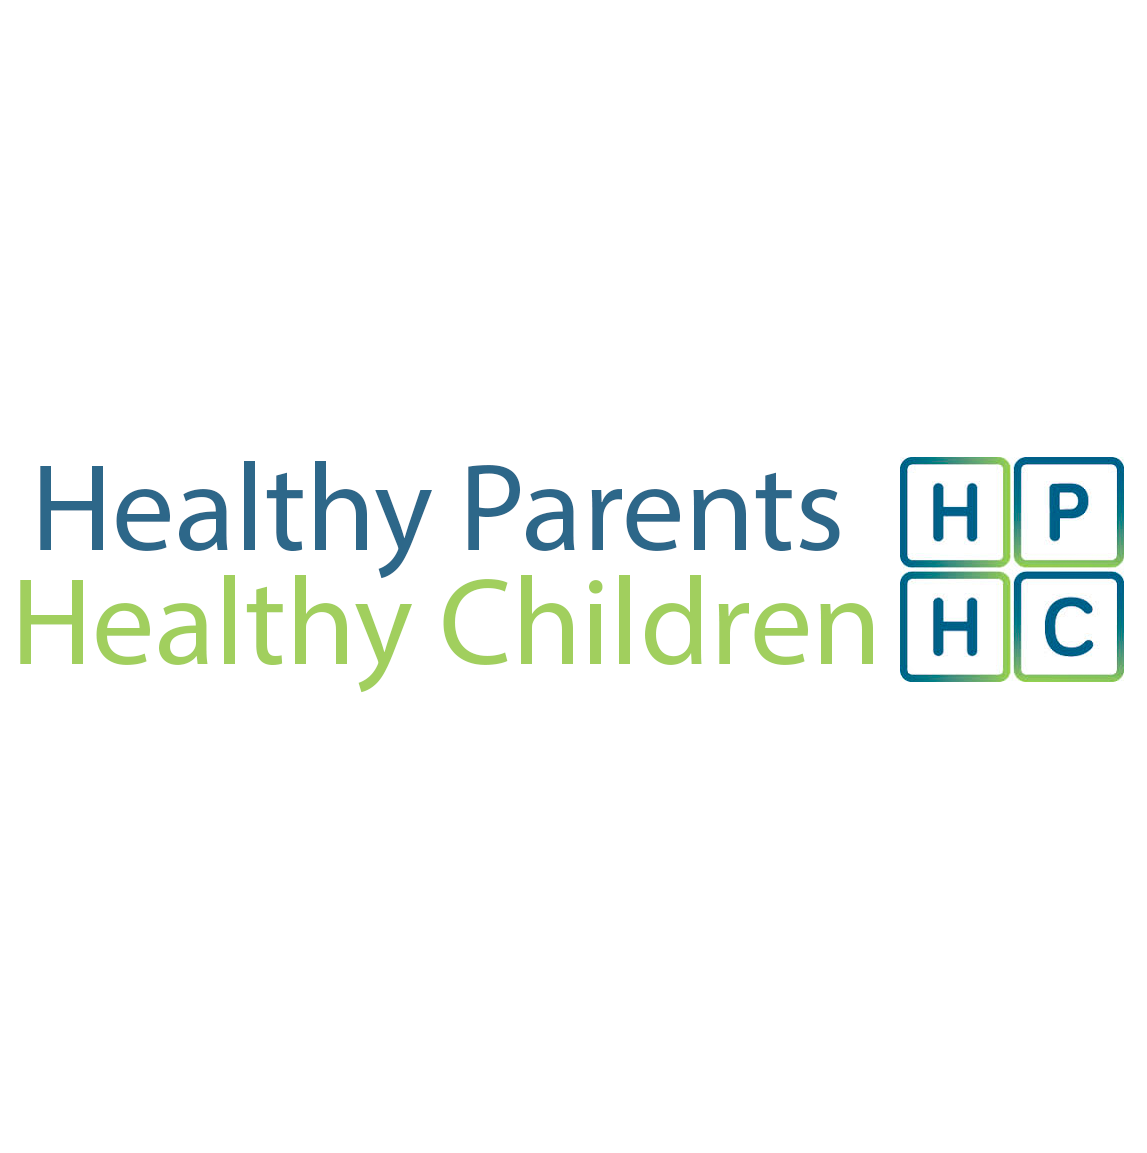 social-network-hphc-logo.png